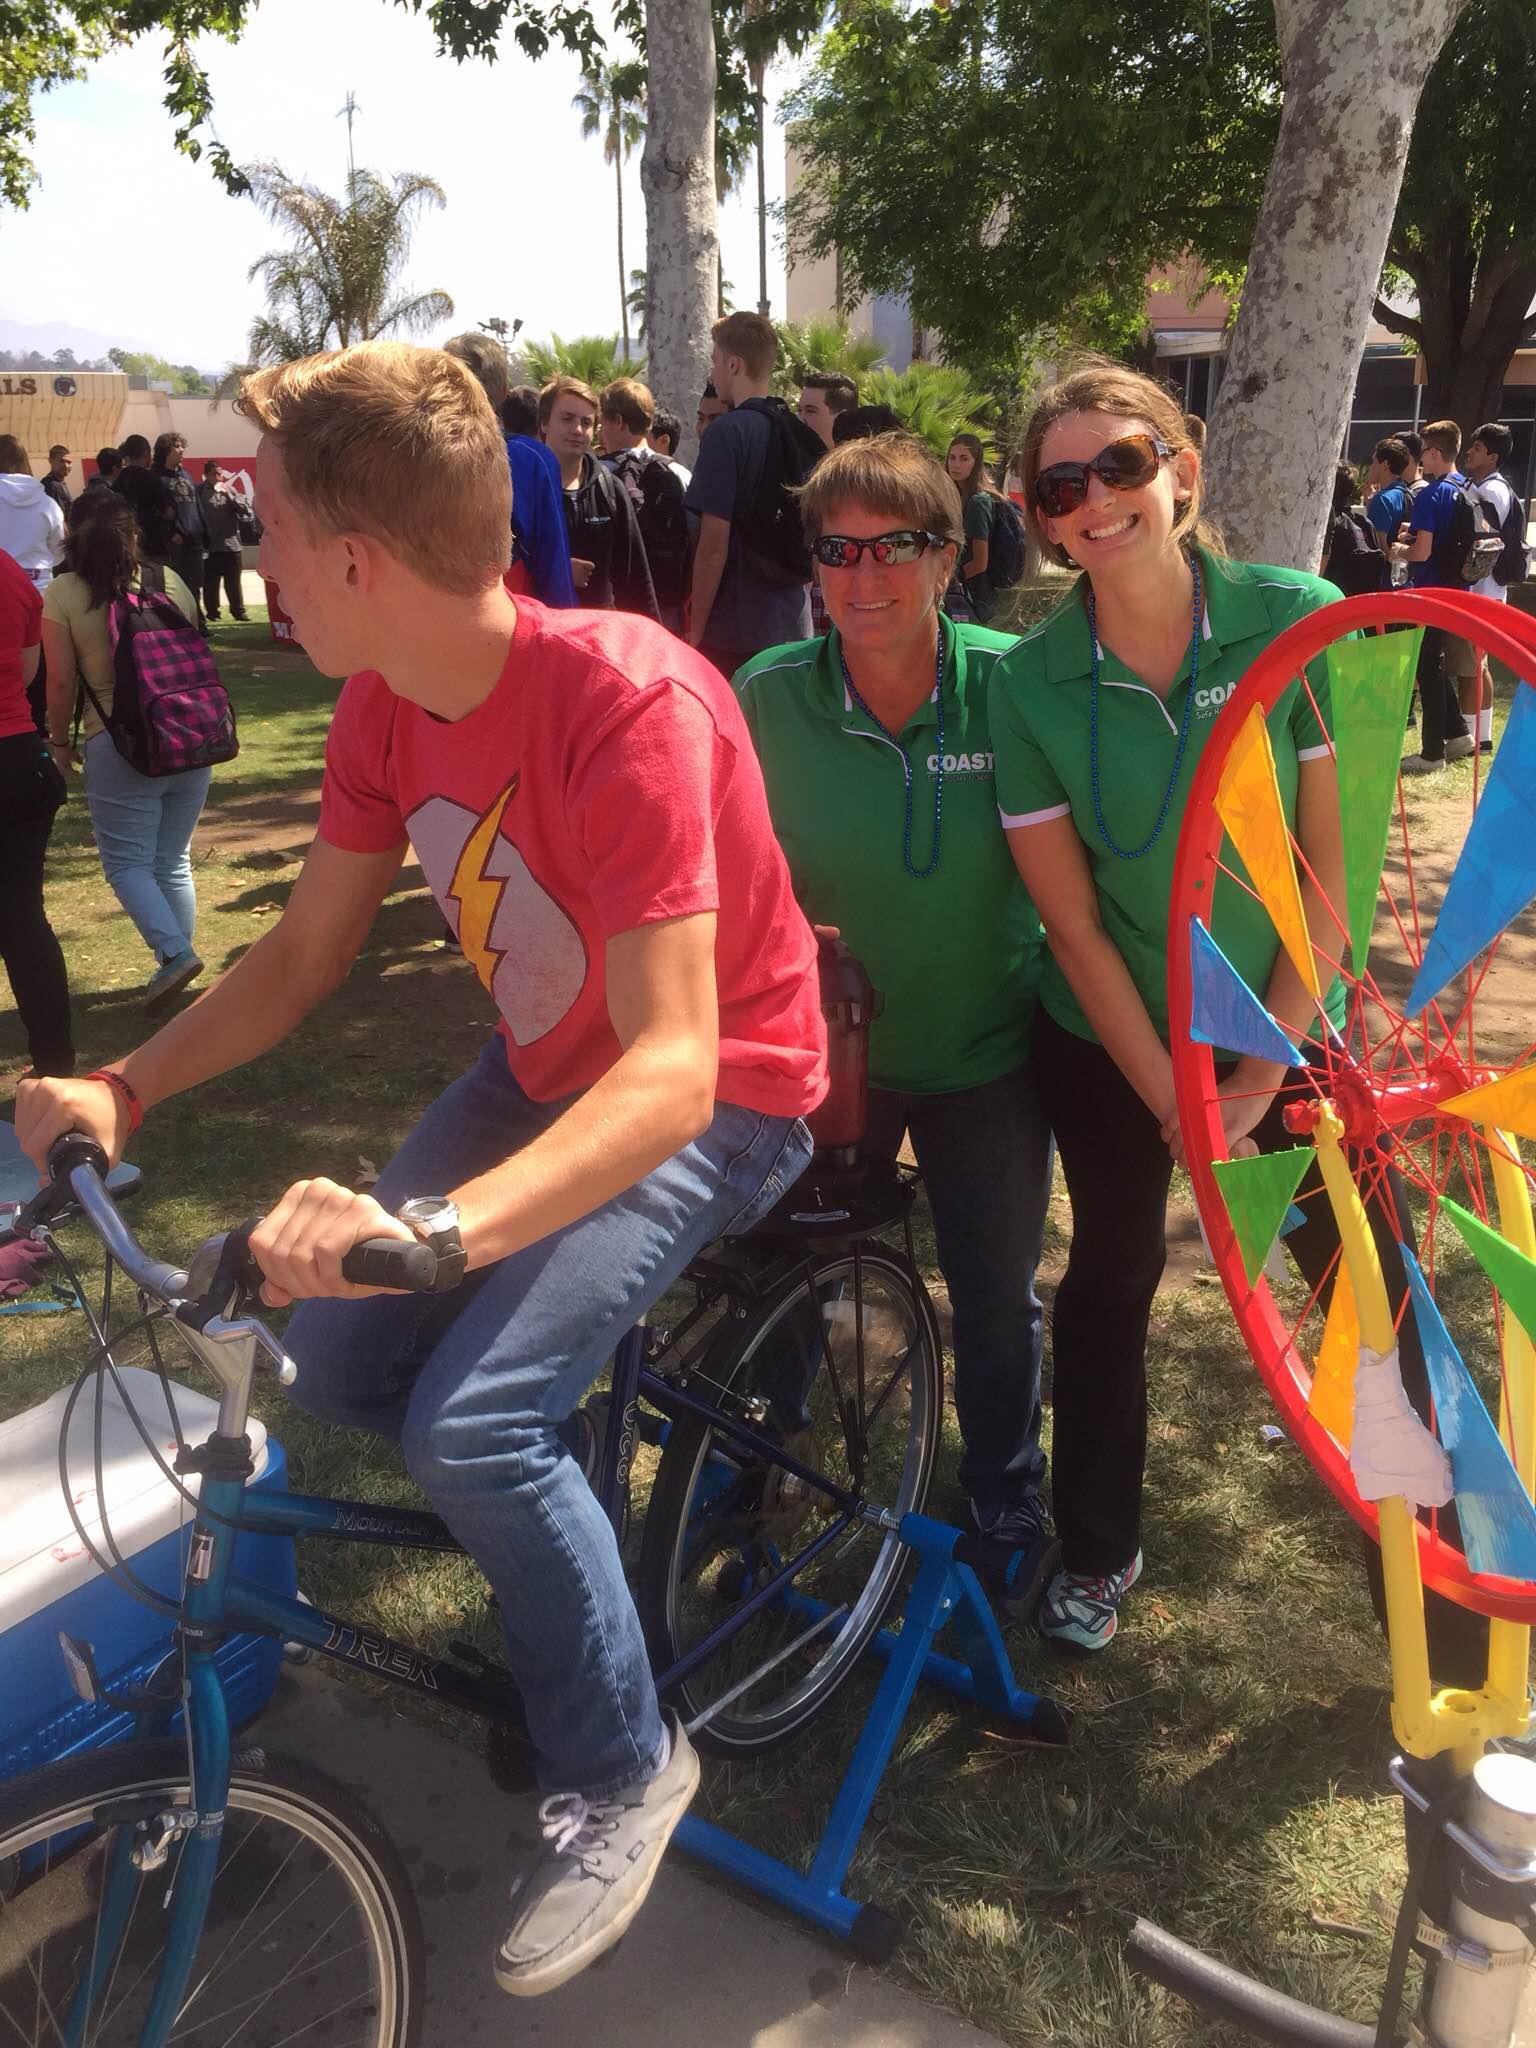 Bike Blender Smoothies & Trivia Wheel Challenge!